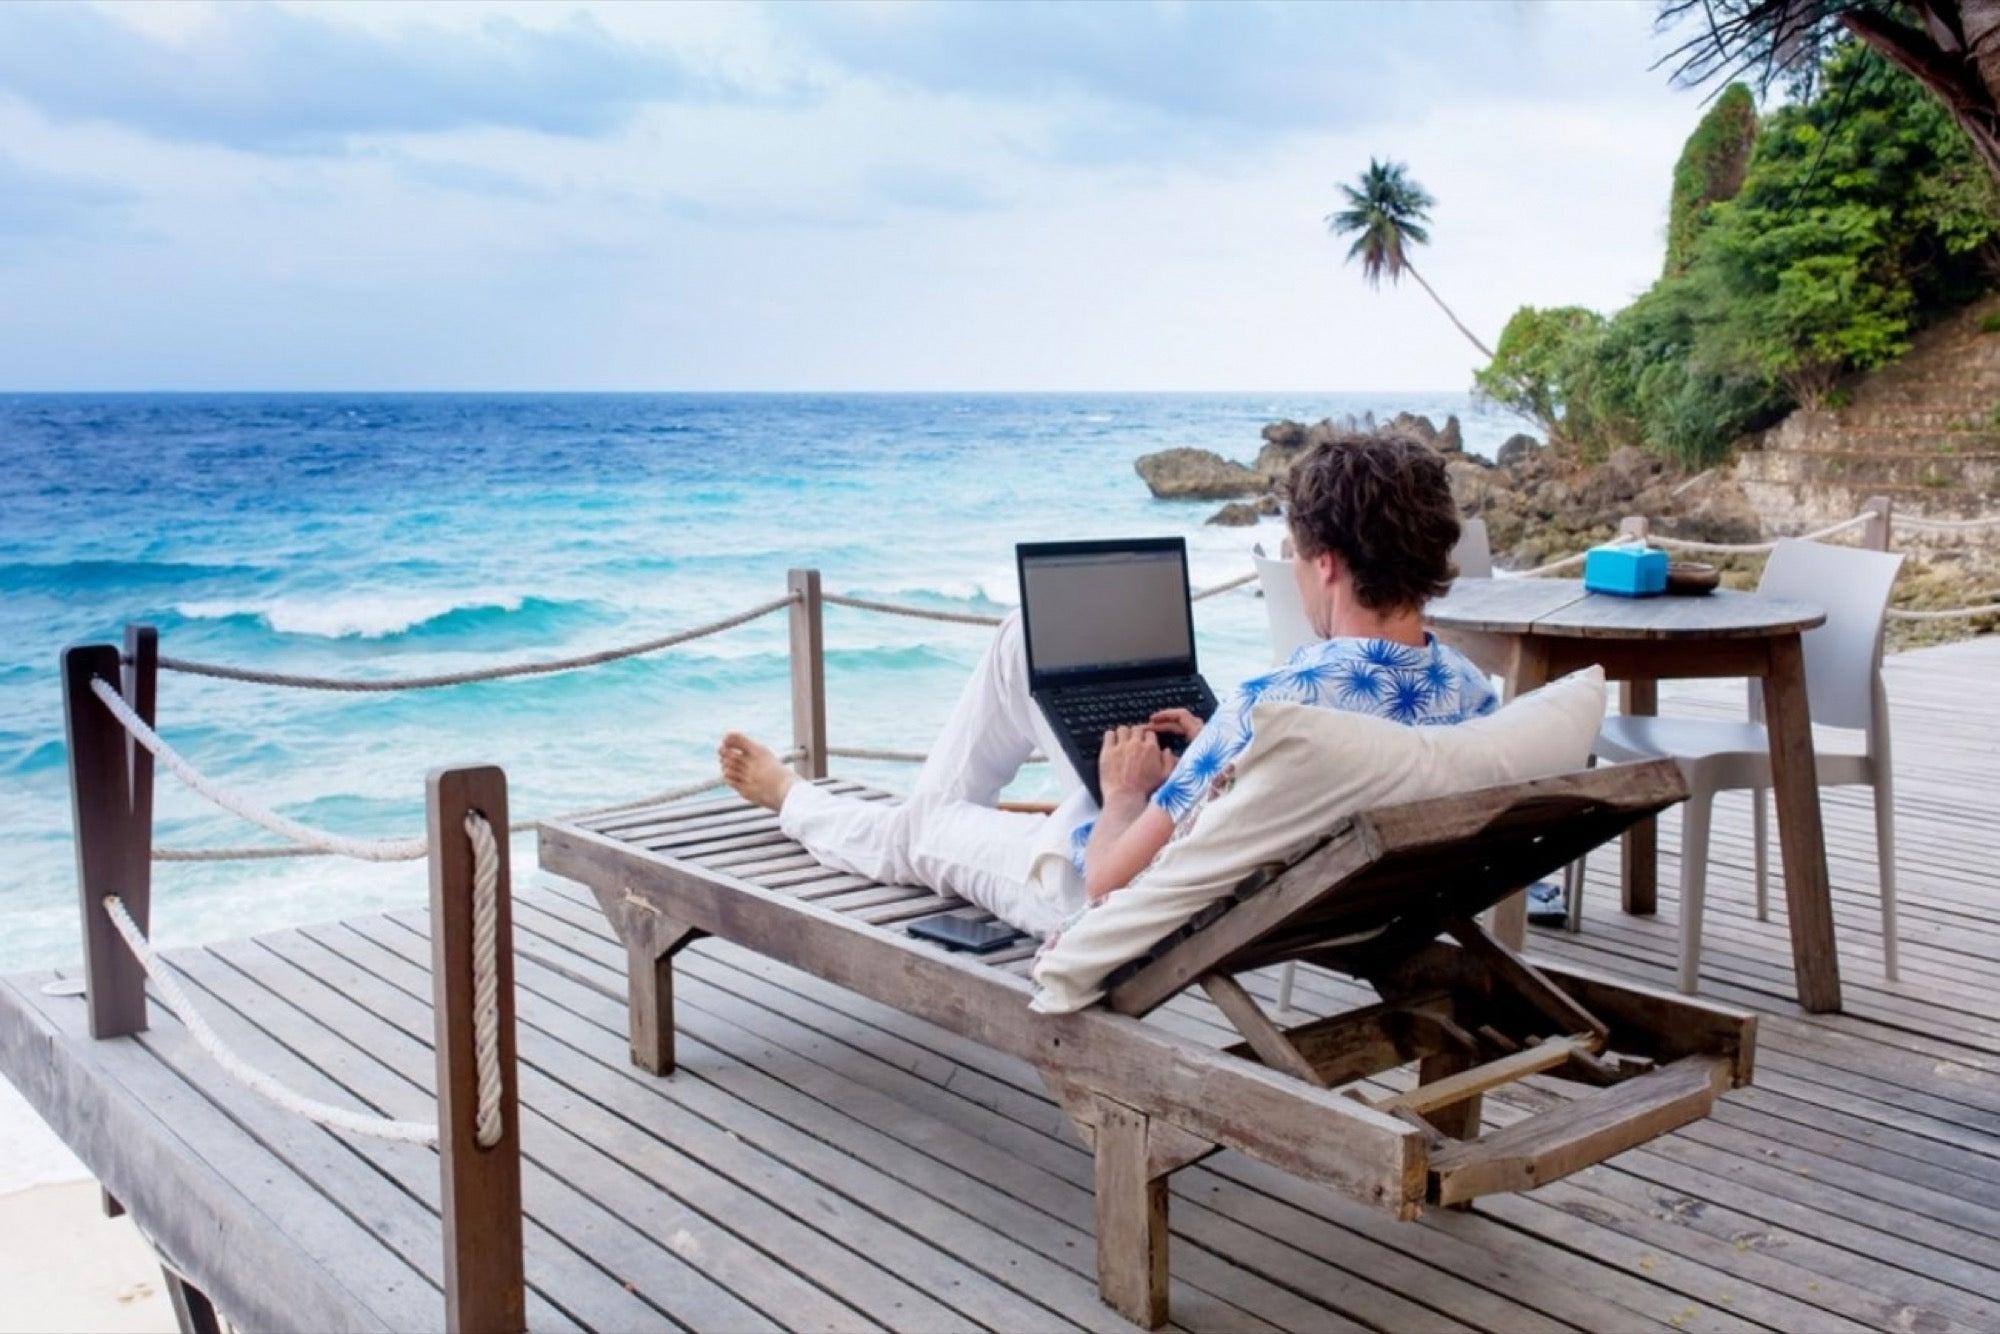 Freelance вакансии удаленно работа бухгалтером на удаленном доступе вакансии в спб